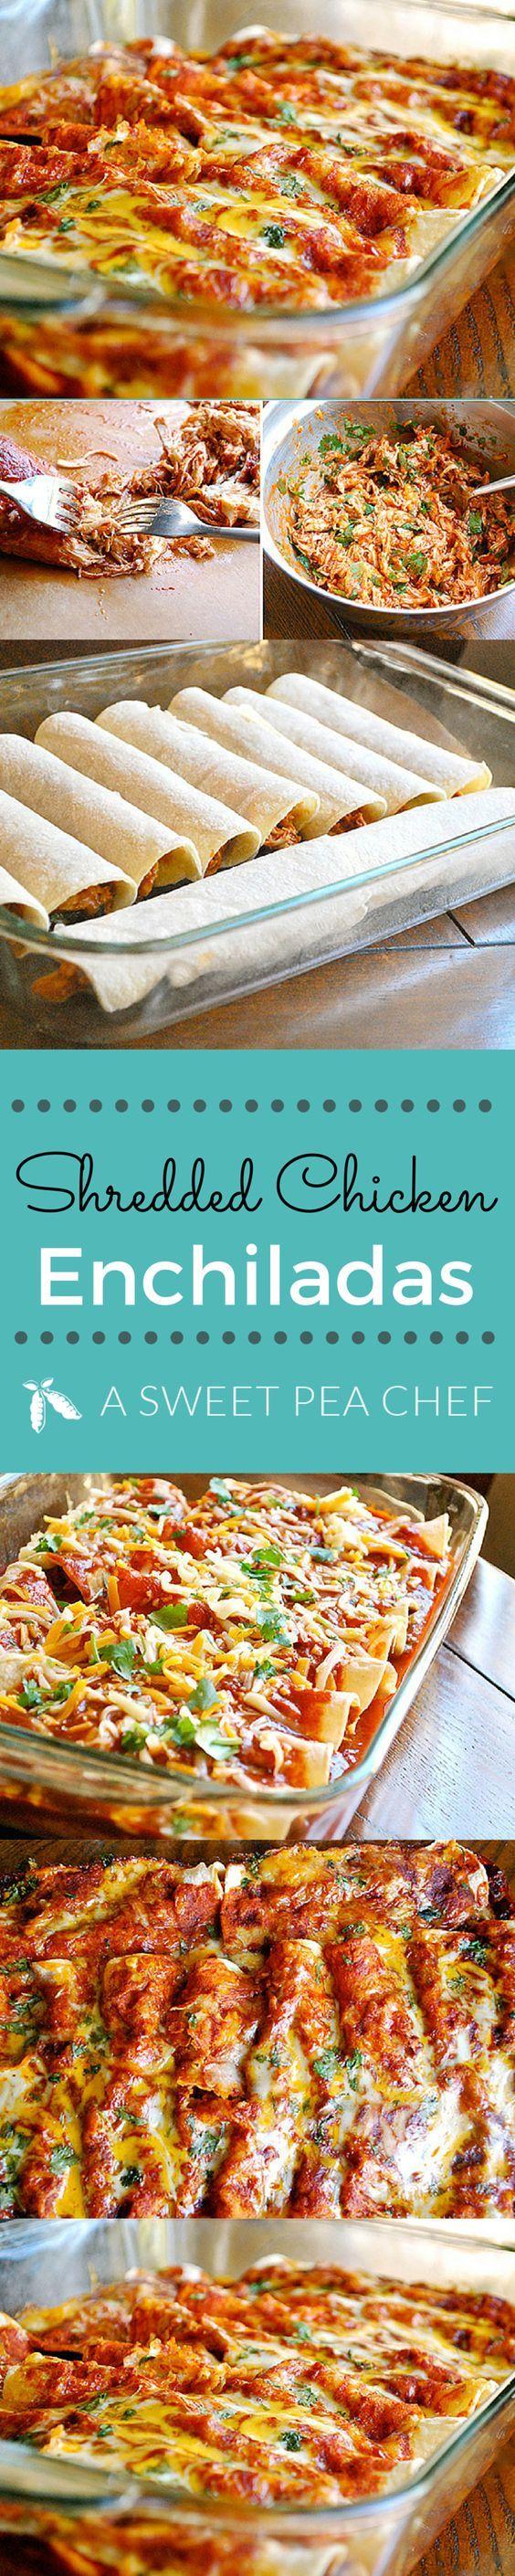 Shredded Chicken Enchiladas great dinner best chicken enchiladas #chicken #enchiladas #dinner  Lacey Baier www.asweetpeachef.com